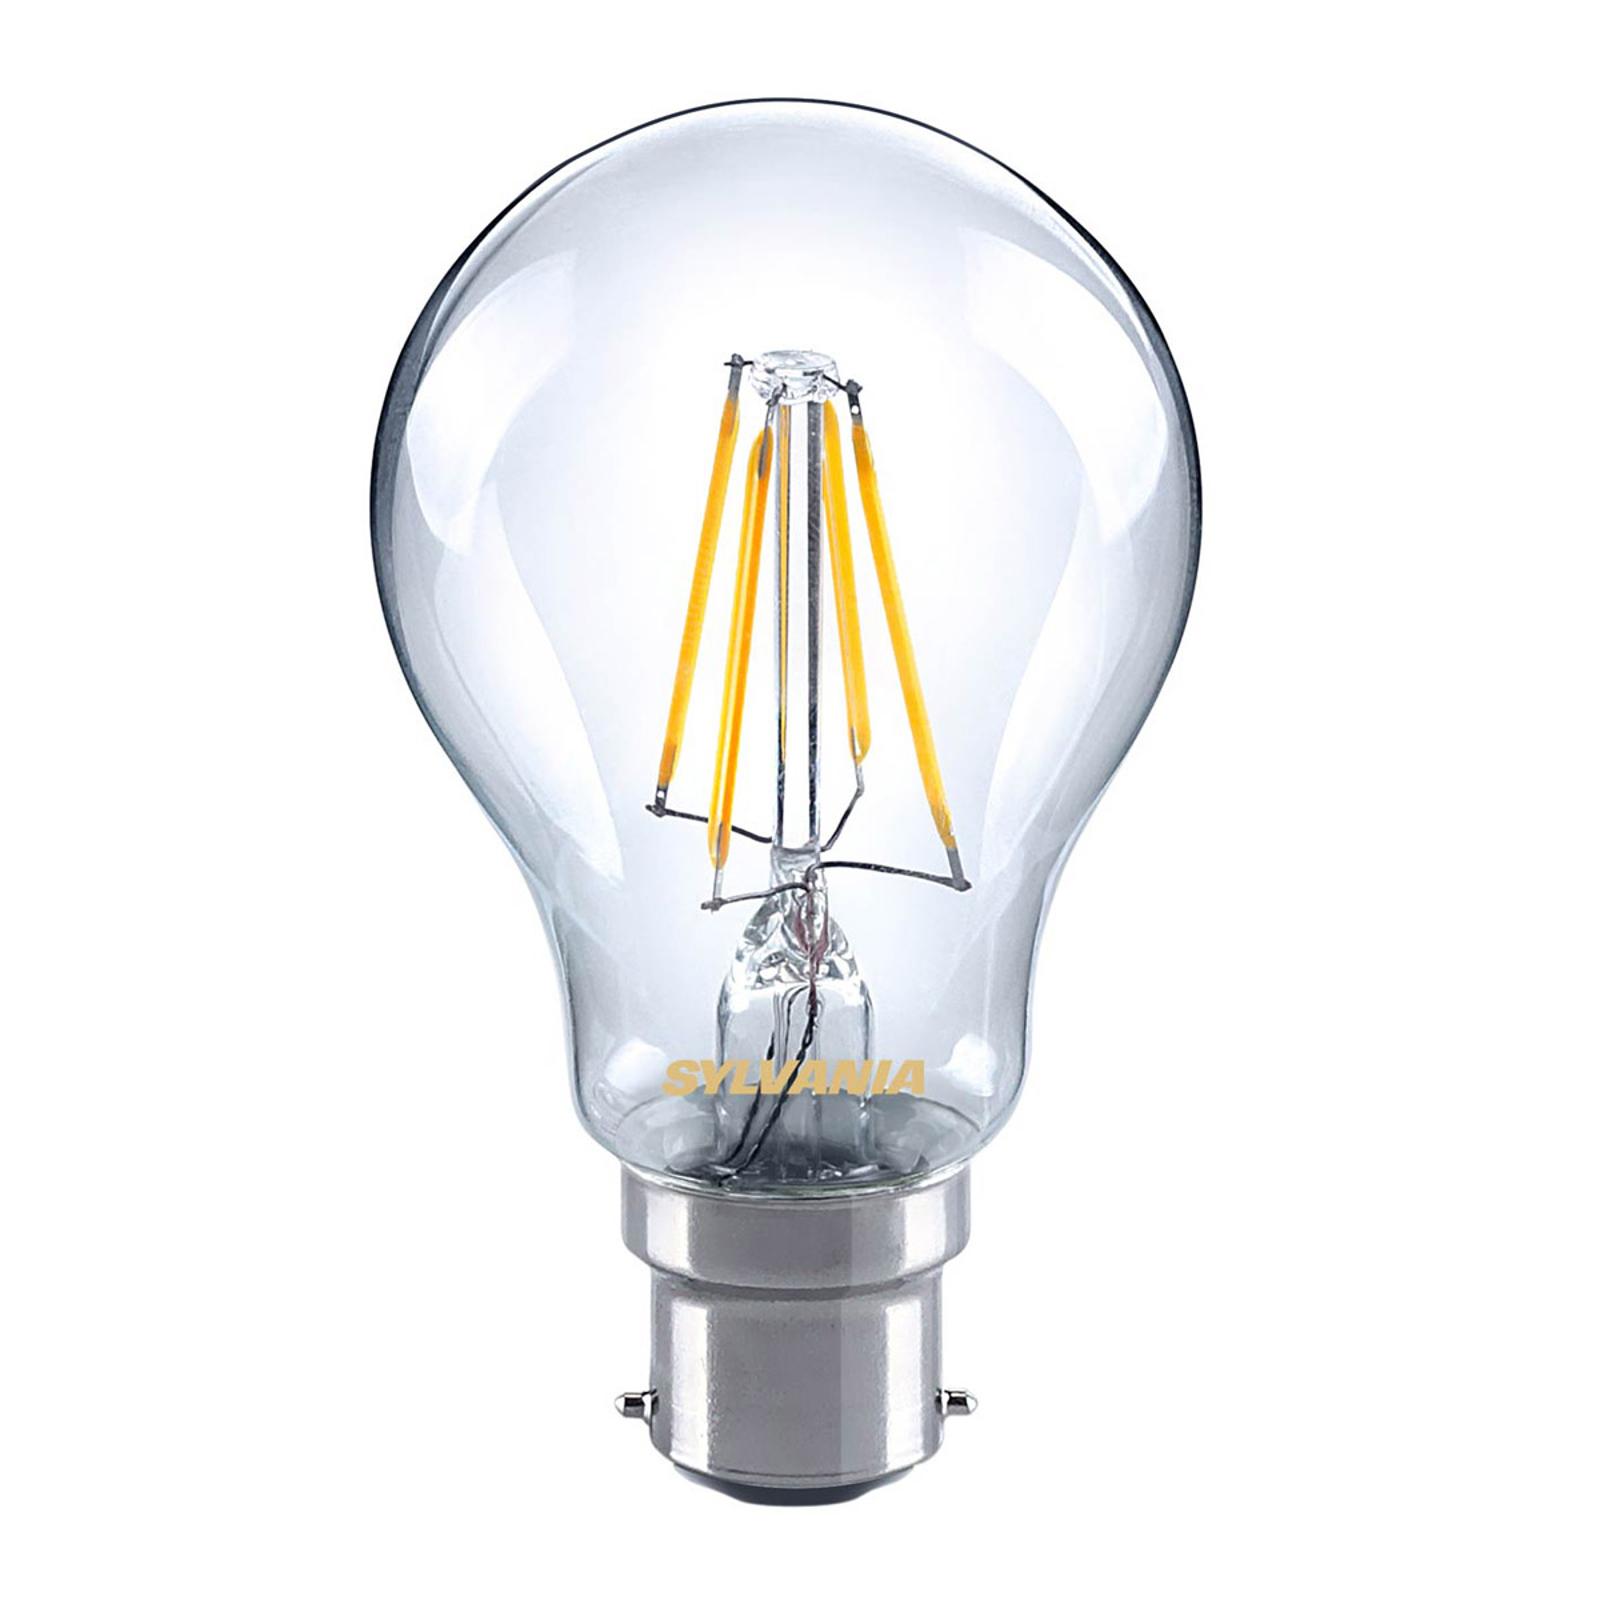 B22 4W 827 LED-Filament Lampe, klar